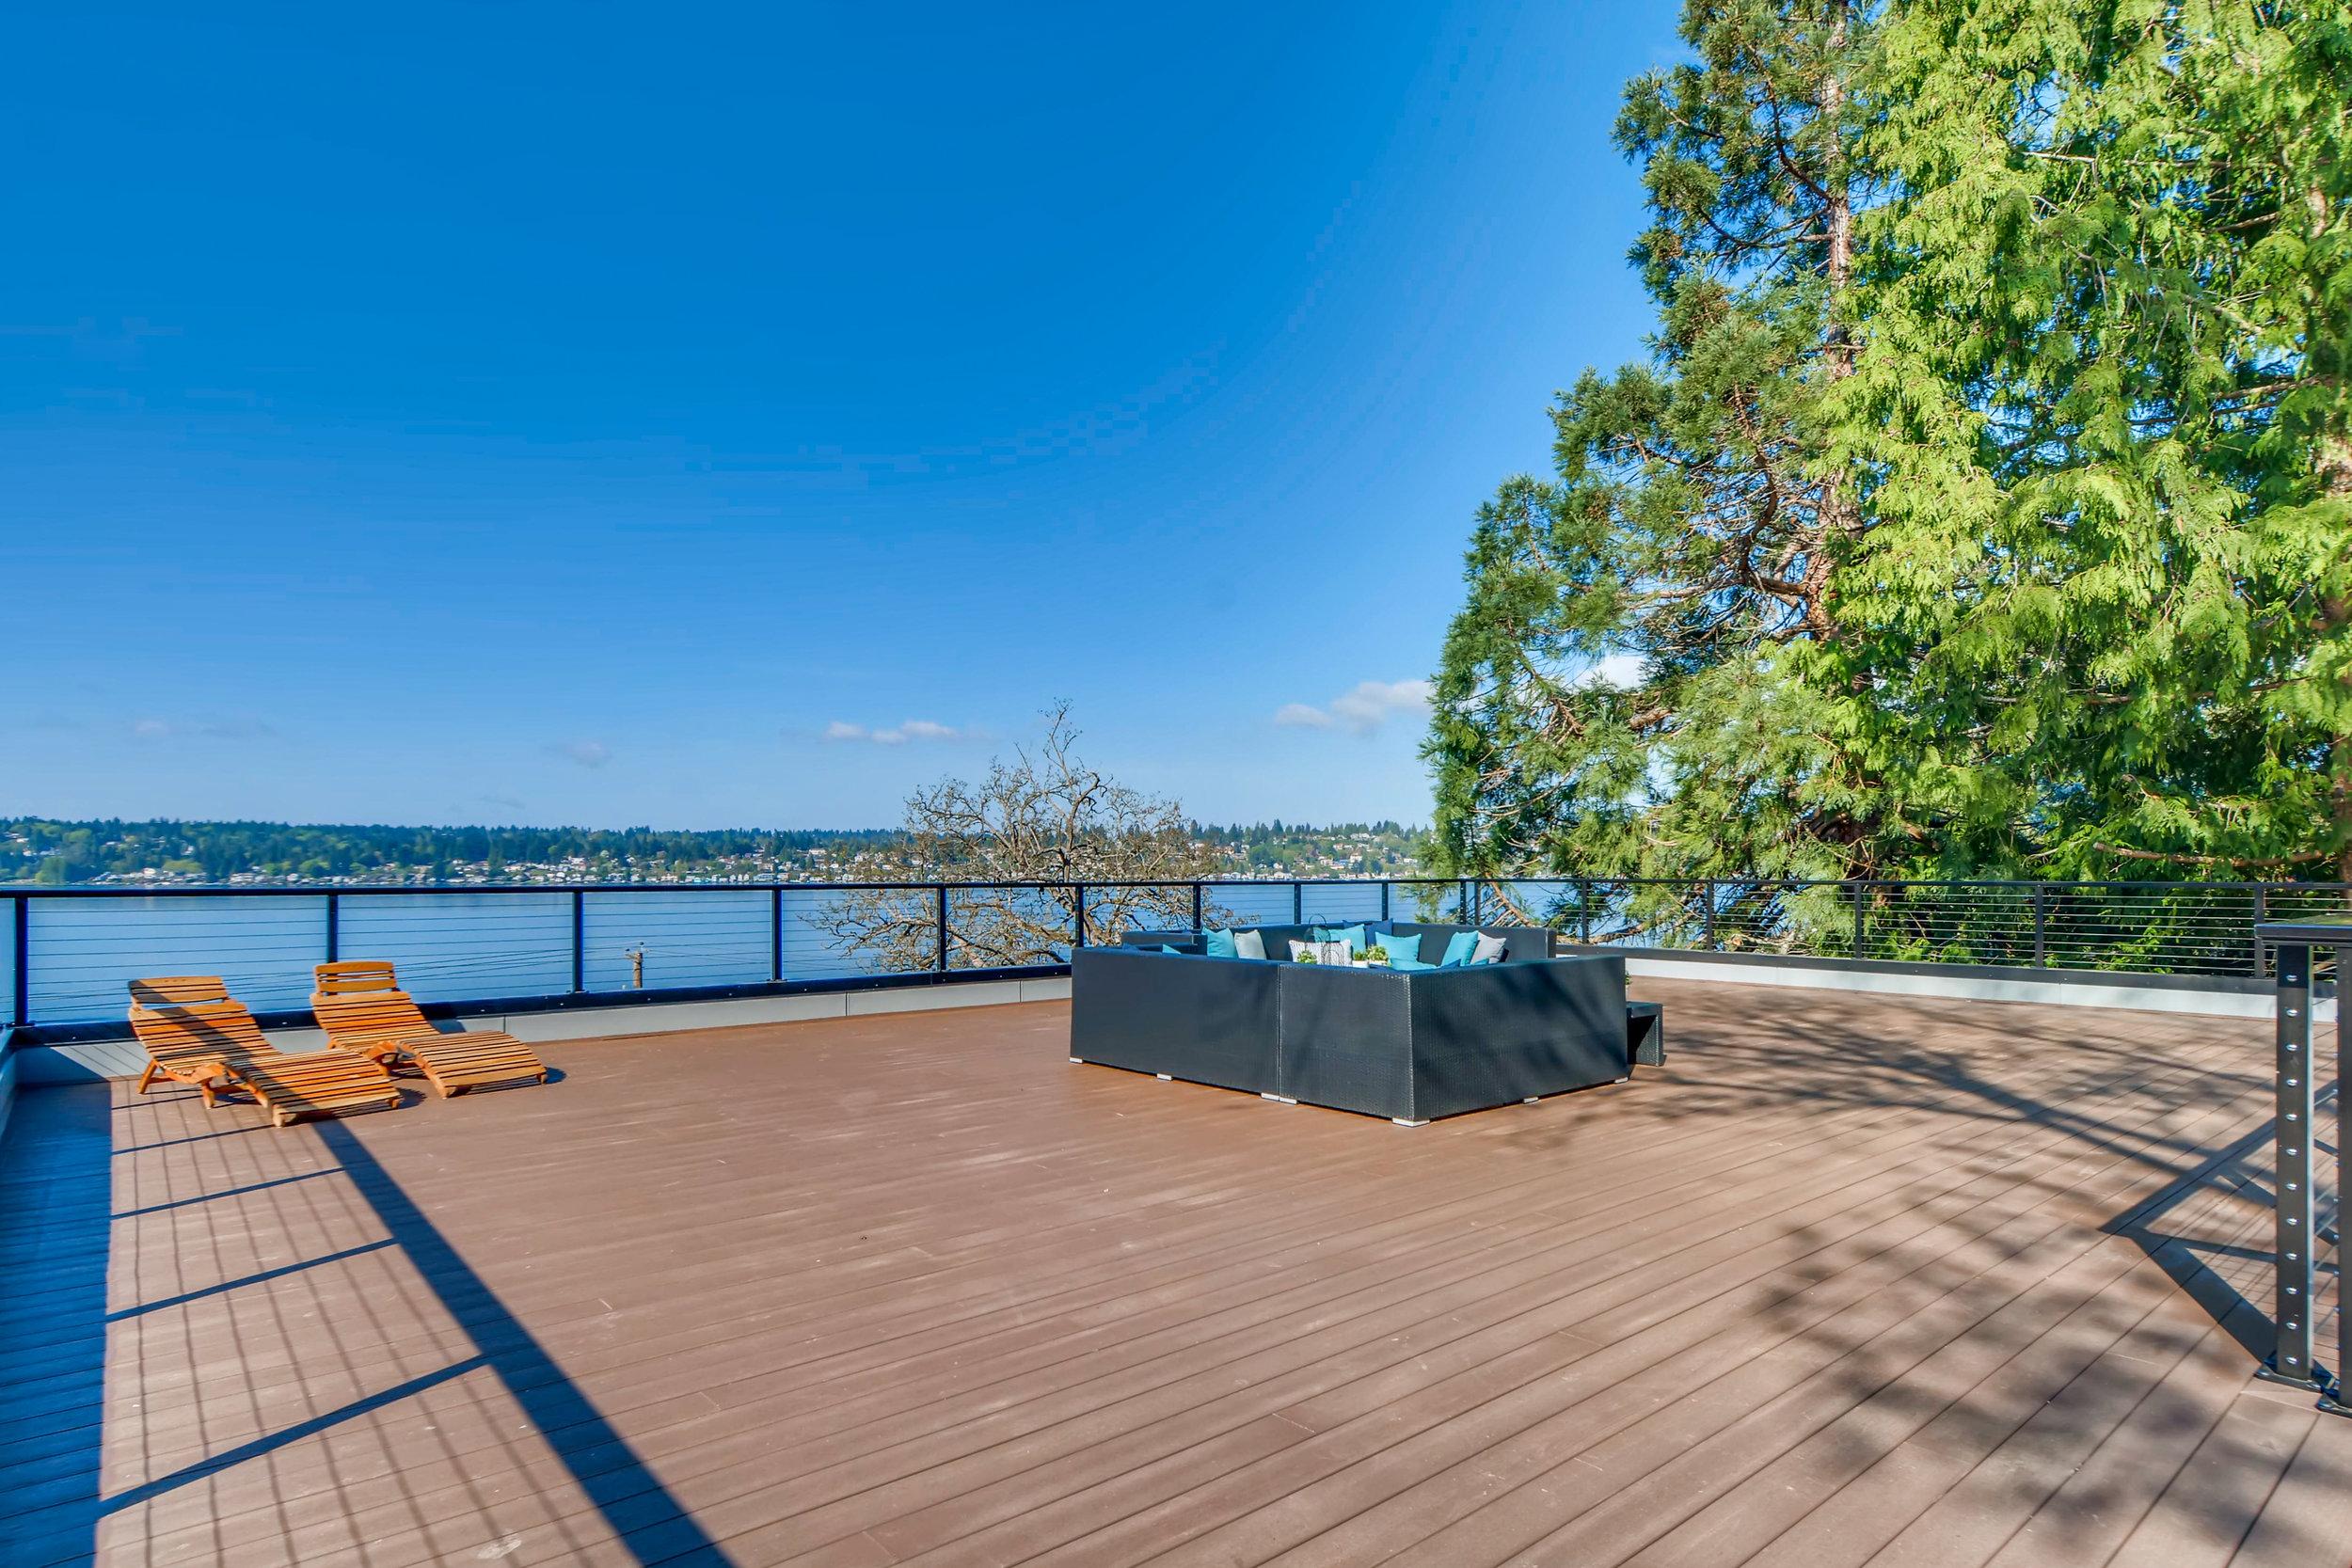 12410 Holmes Point Drive NE-print-036-27-Roof Deck-4200x2802-300dpi.jpg